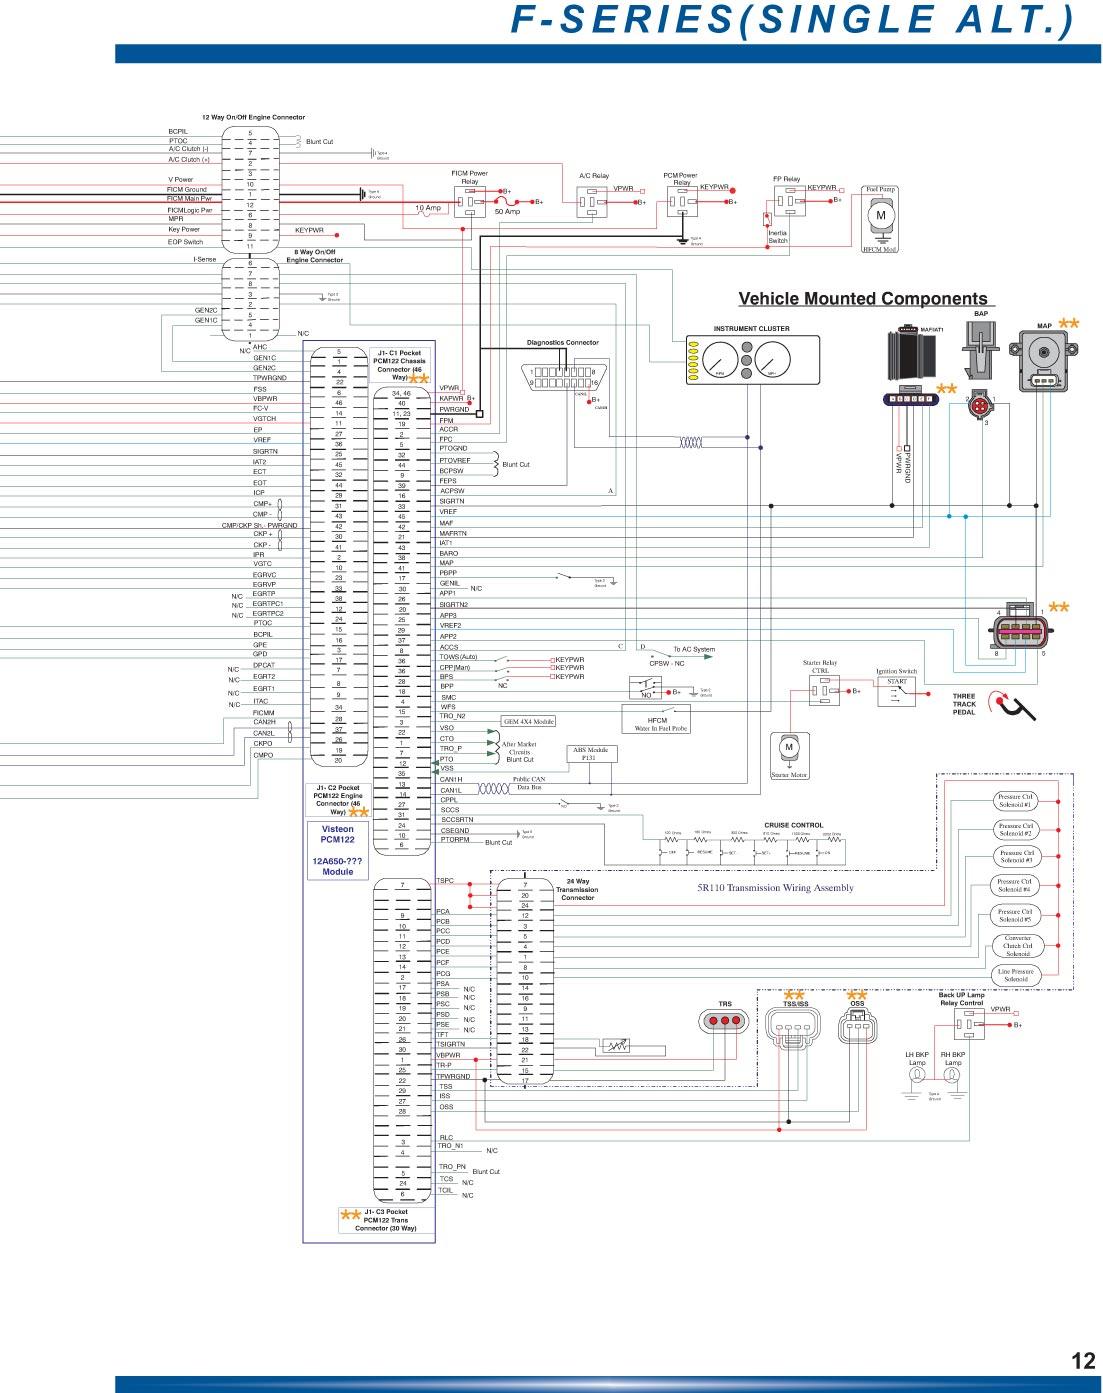 2006 Ford 6 0 Wiring Diagram | nice-superior wiring diagram library |  nice-superior.kivitour.itKivi Tour 2 guida in carrozzina